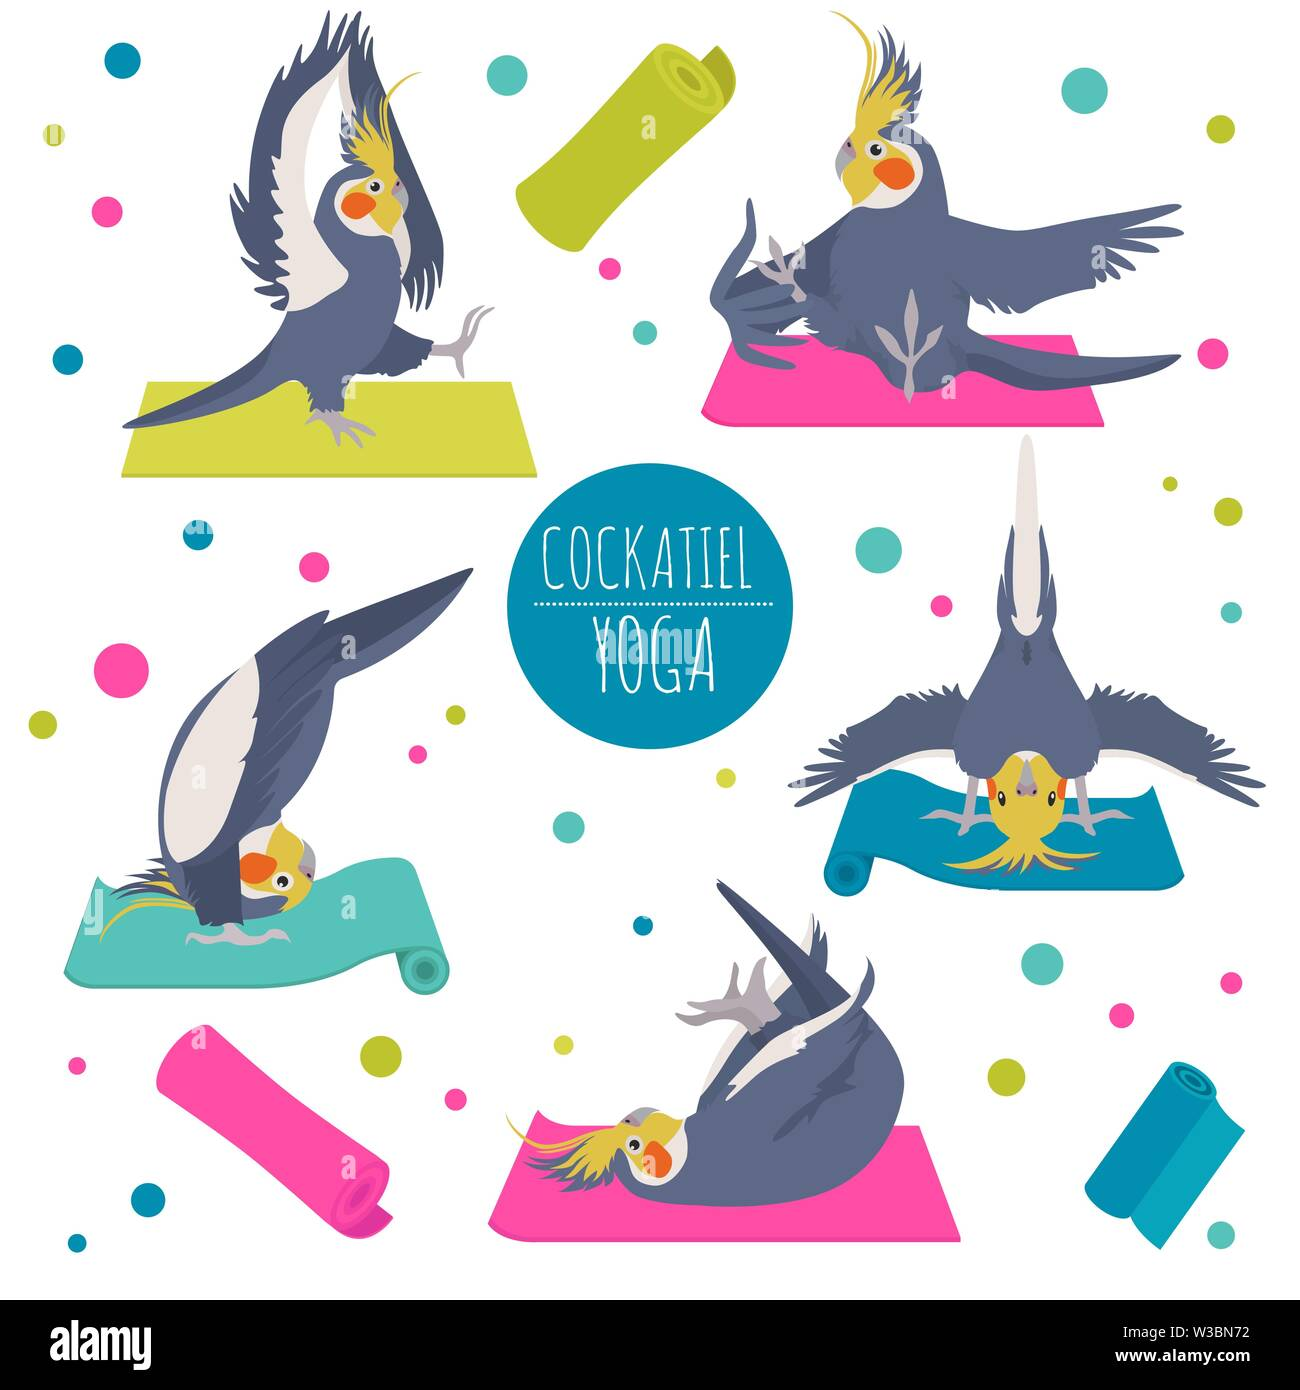 Cockatiel Yoga Poses And Exercises Cute Cartoon Clipart Set Vector Illustration Stock Vector Image Art Alamy